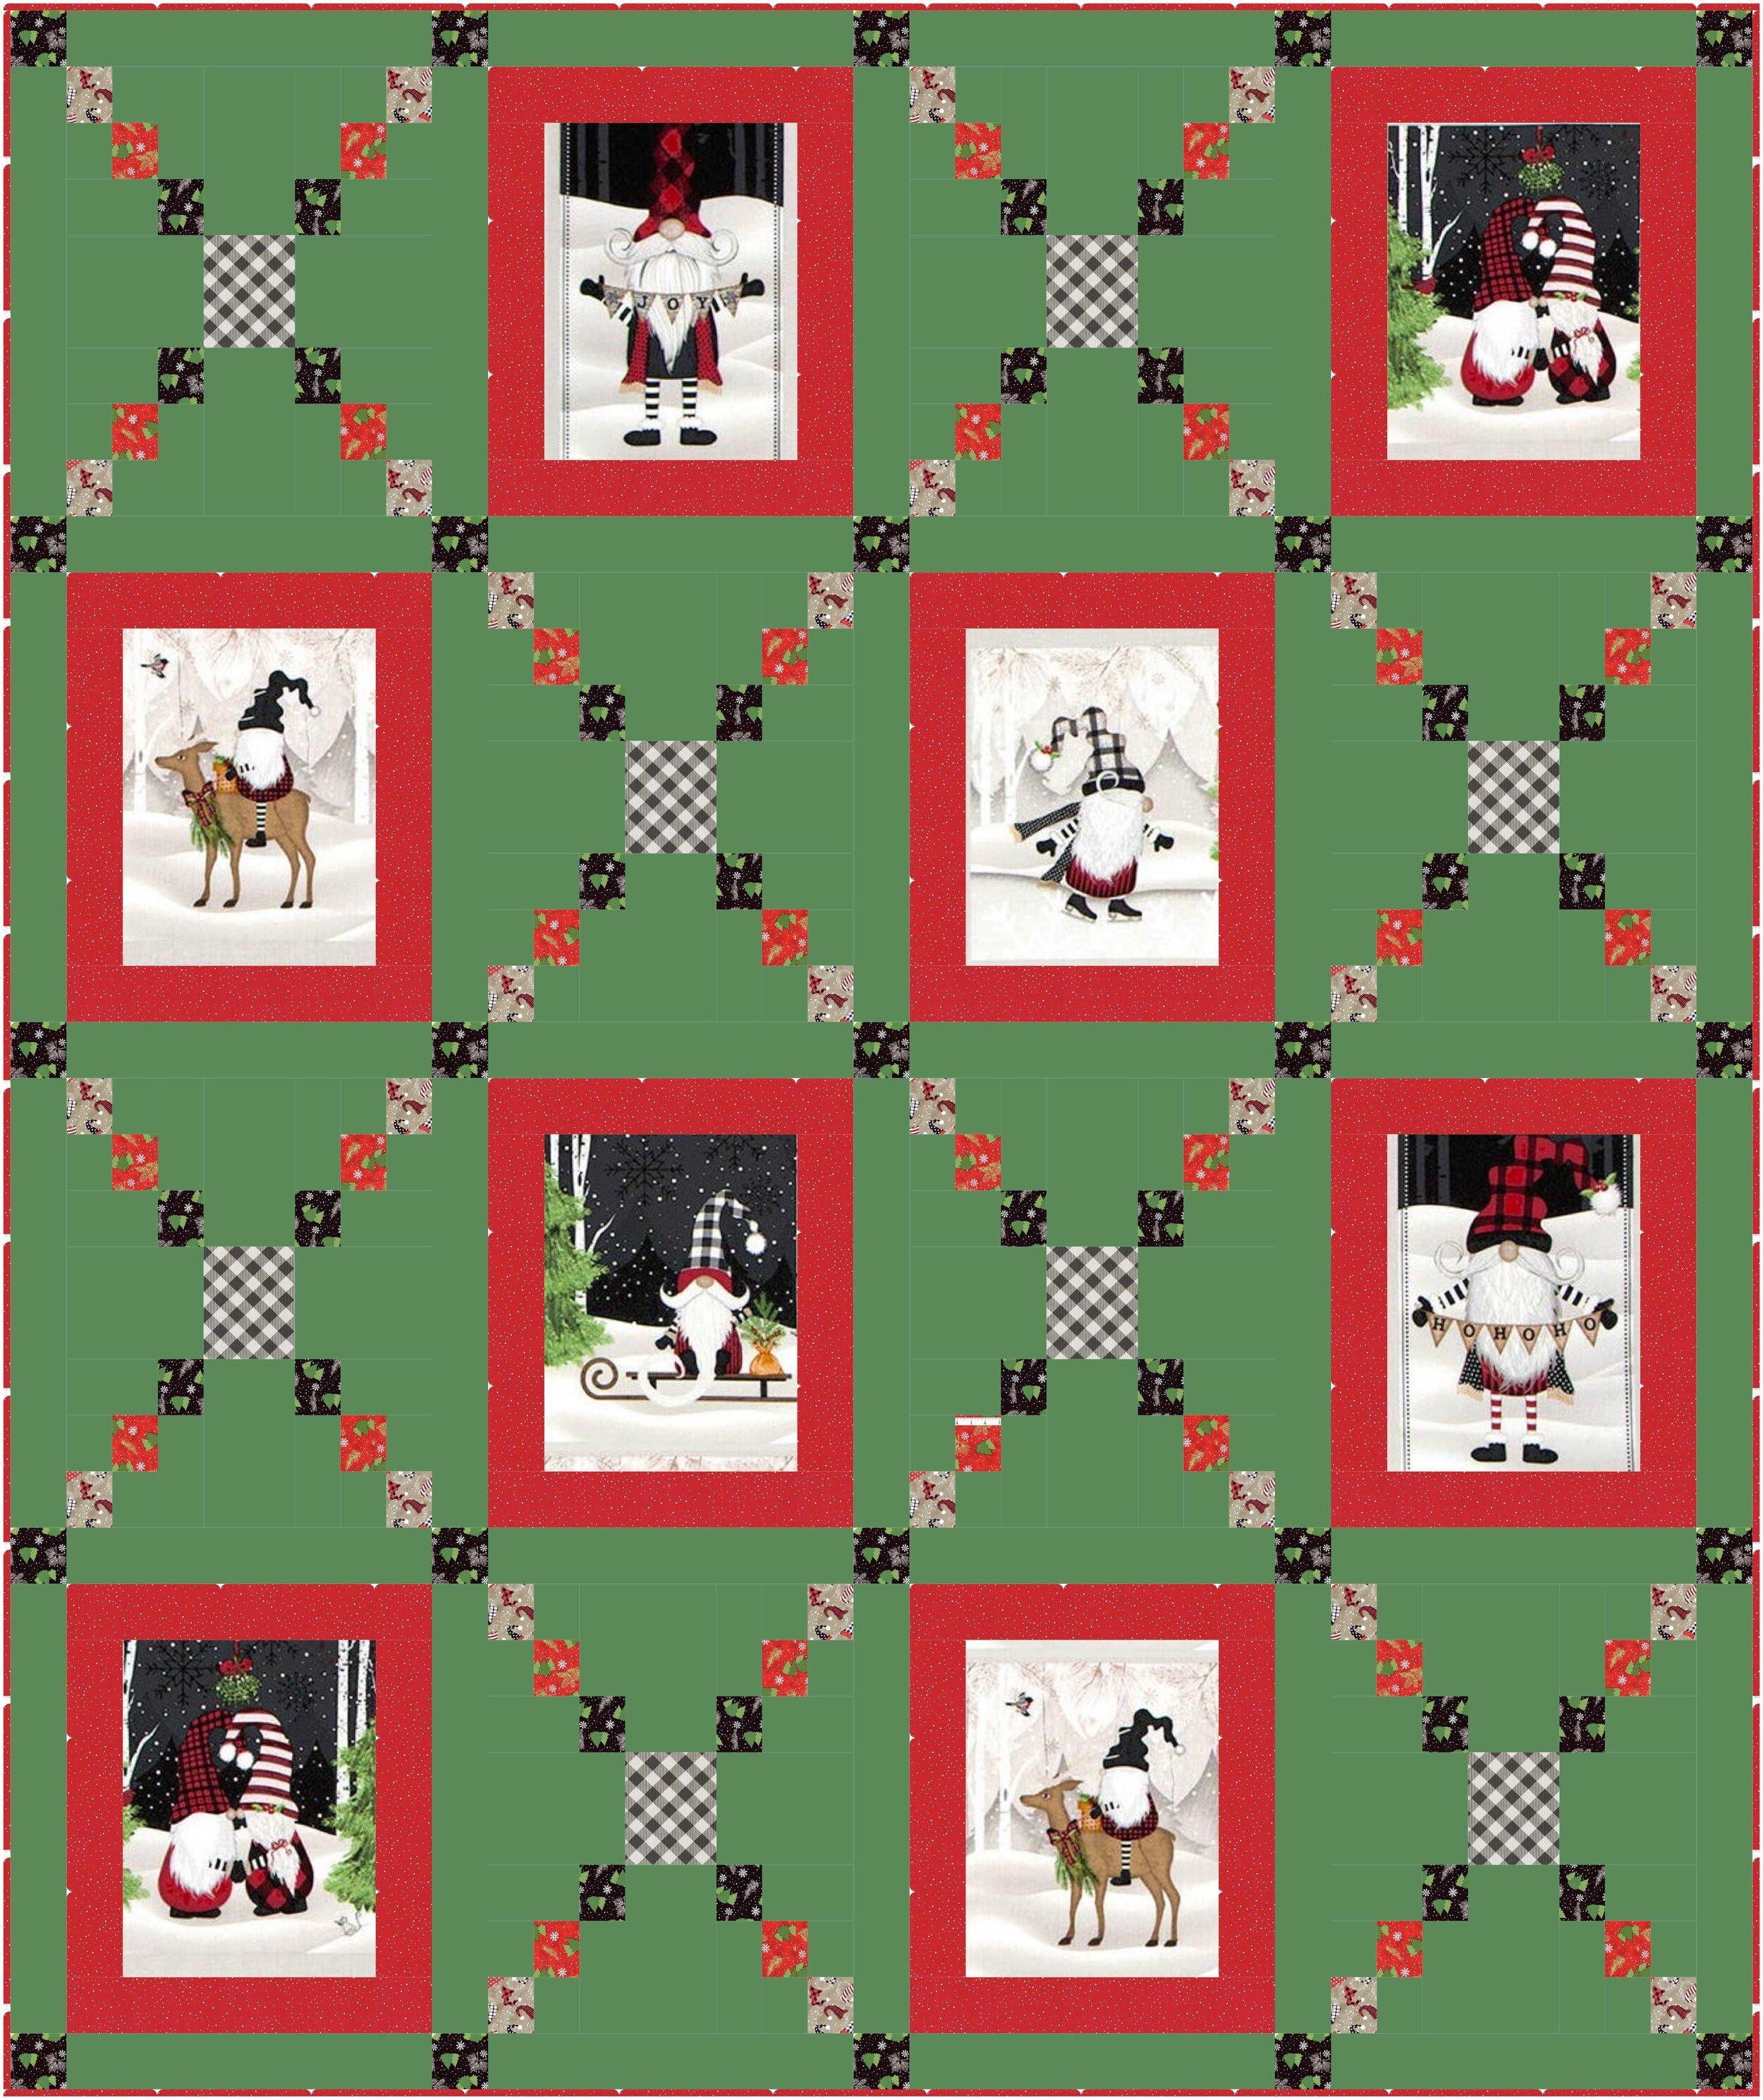 Christmas Gnomes.jpg